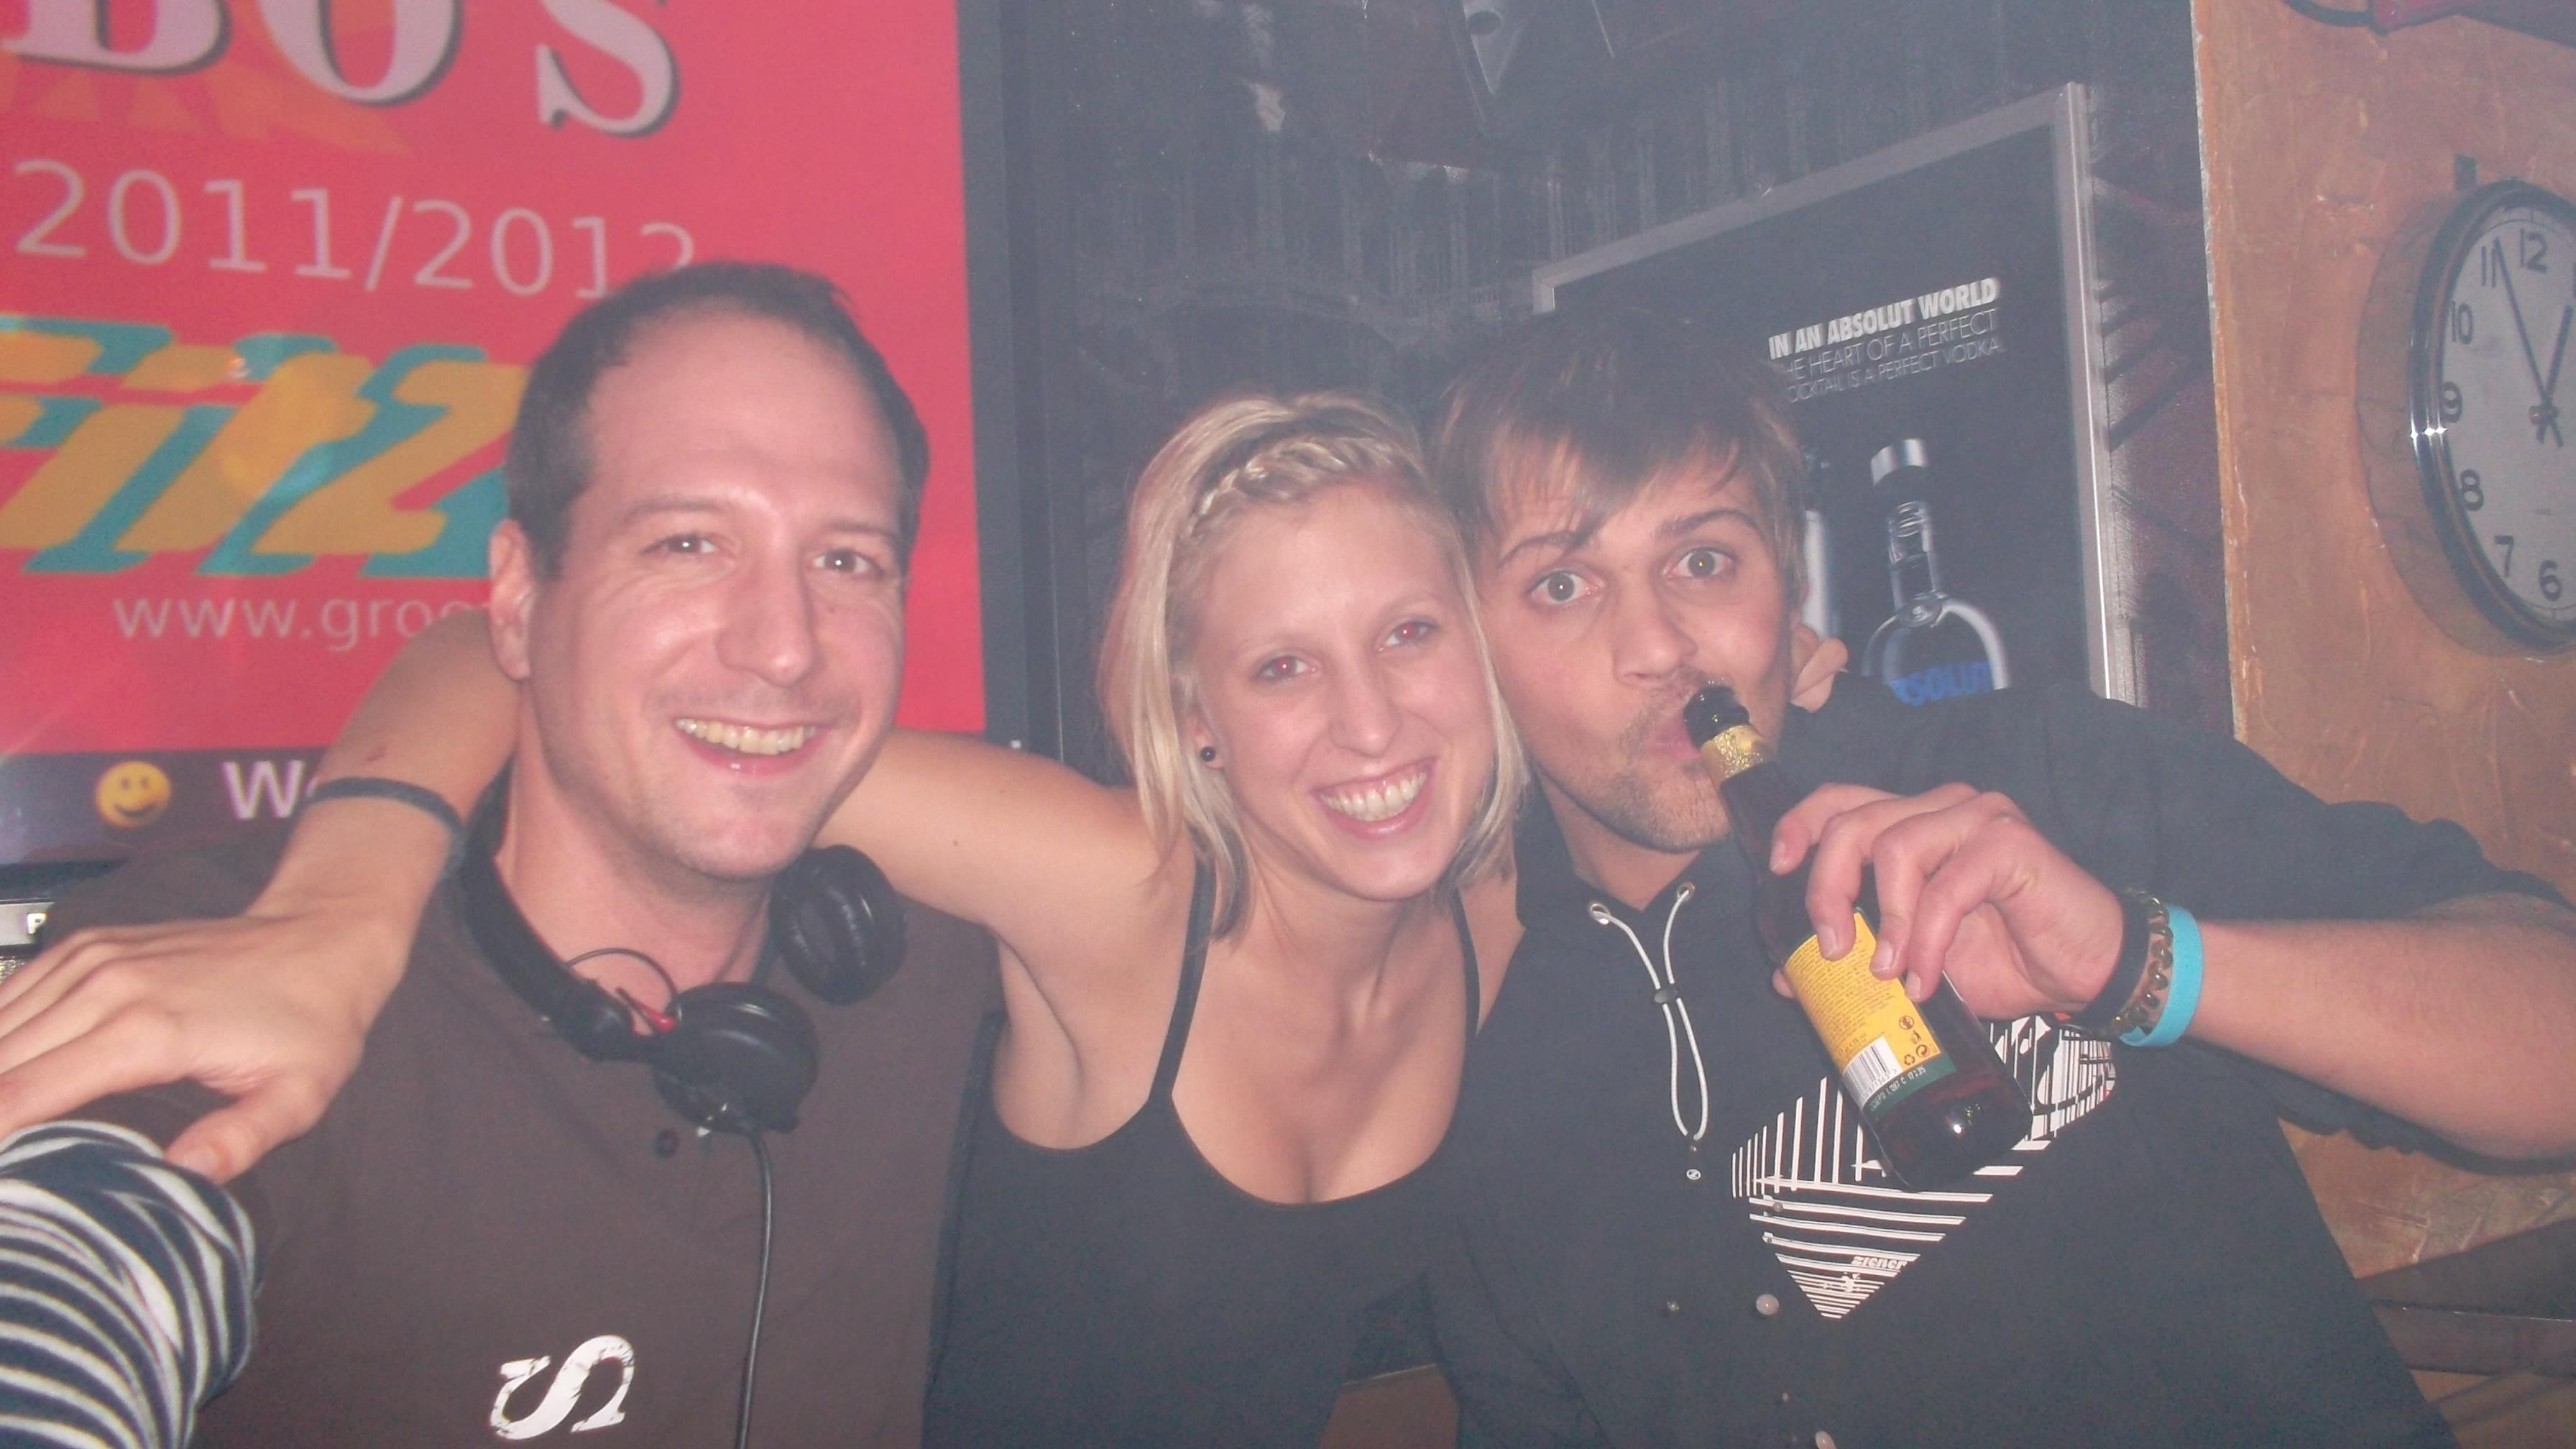 bobos2011und12-029